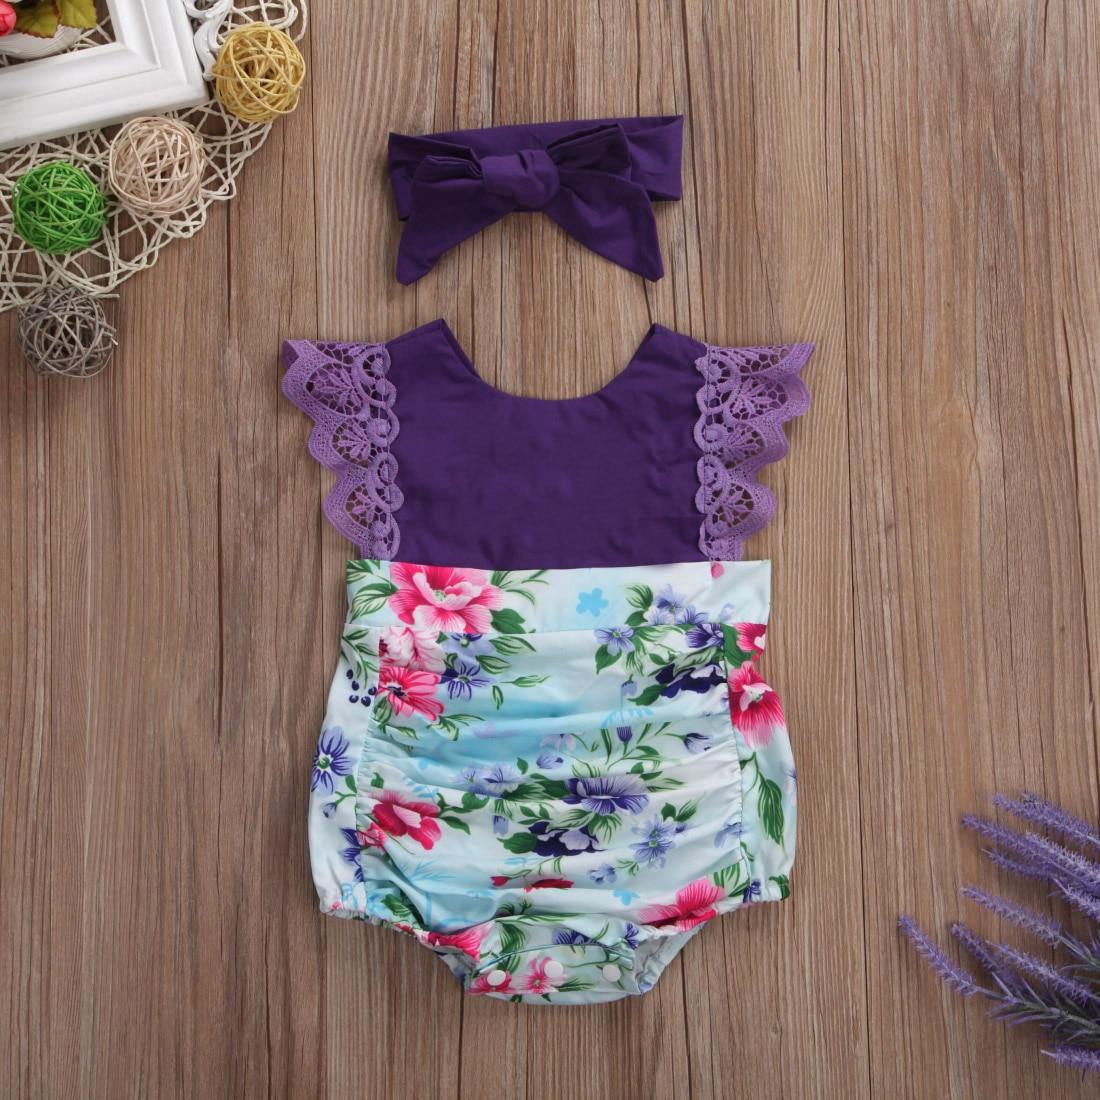 566c1ede1dc1 Princess 2Pcs Purple Flower Sister Matching Newborn Baby Jumpsuit ...